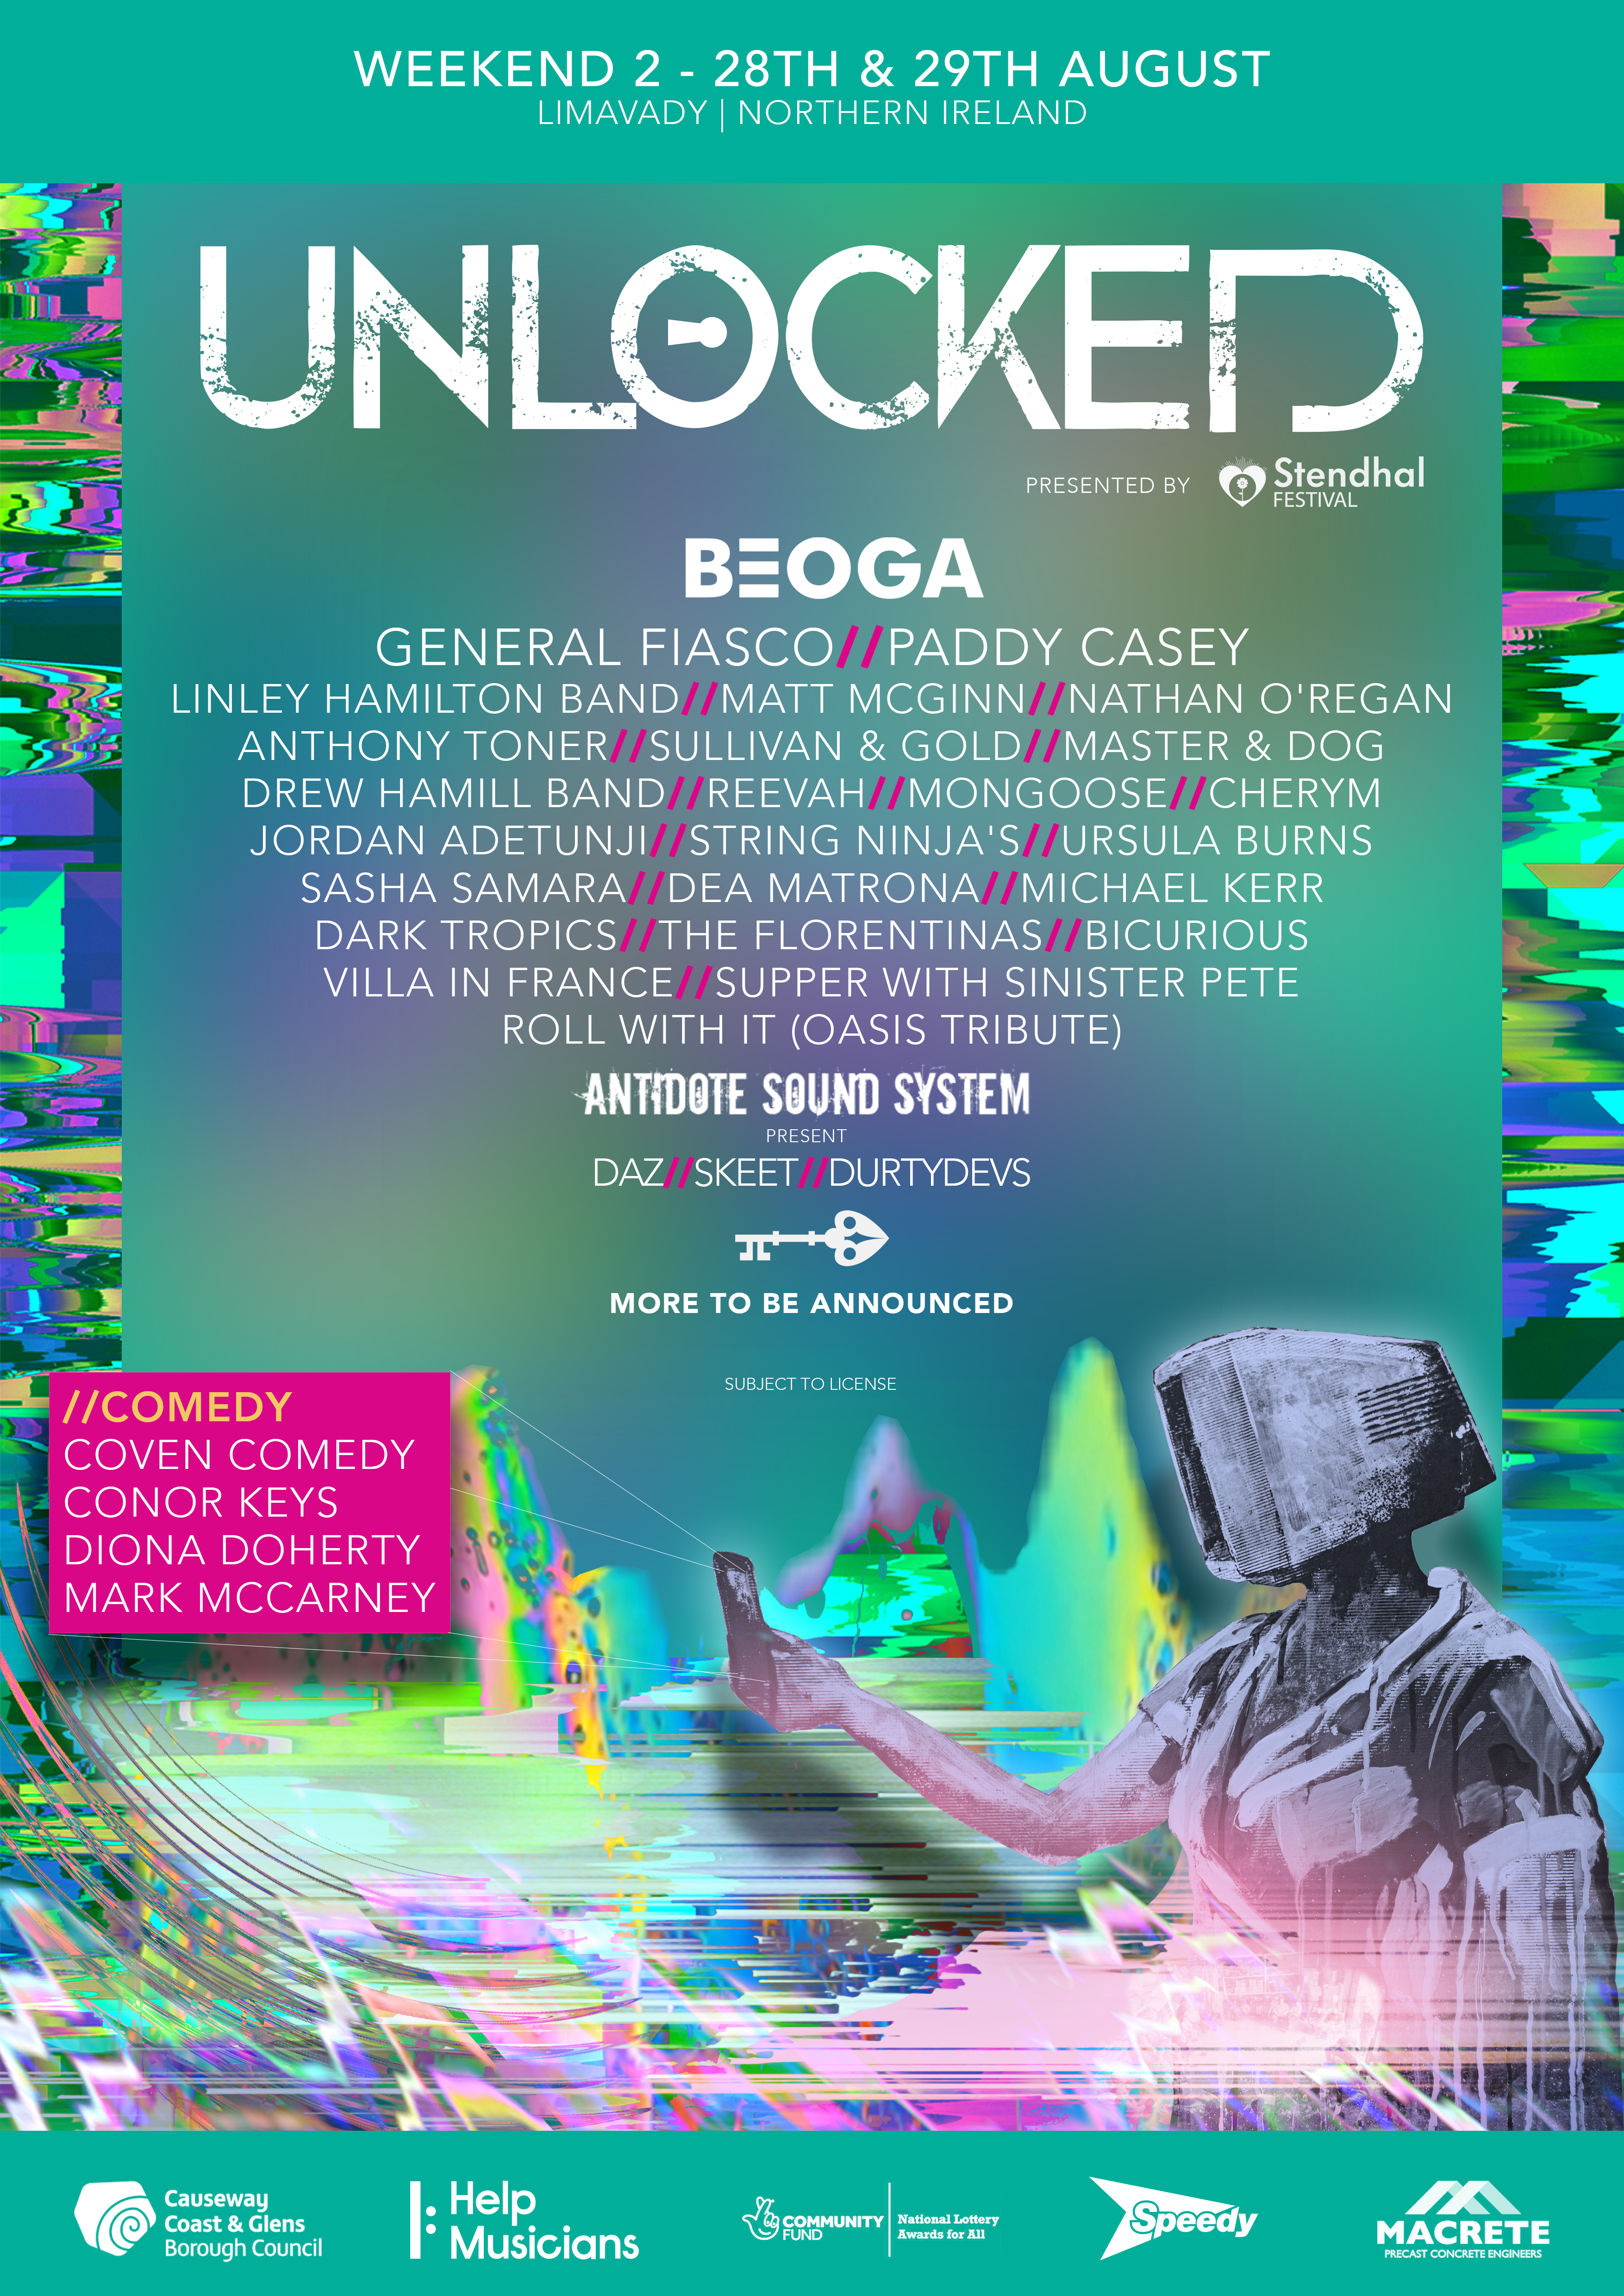 Unlocked Event 2 Lineup